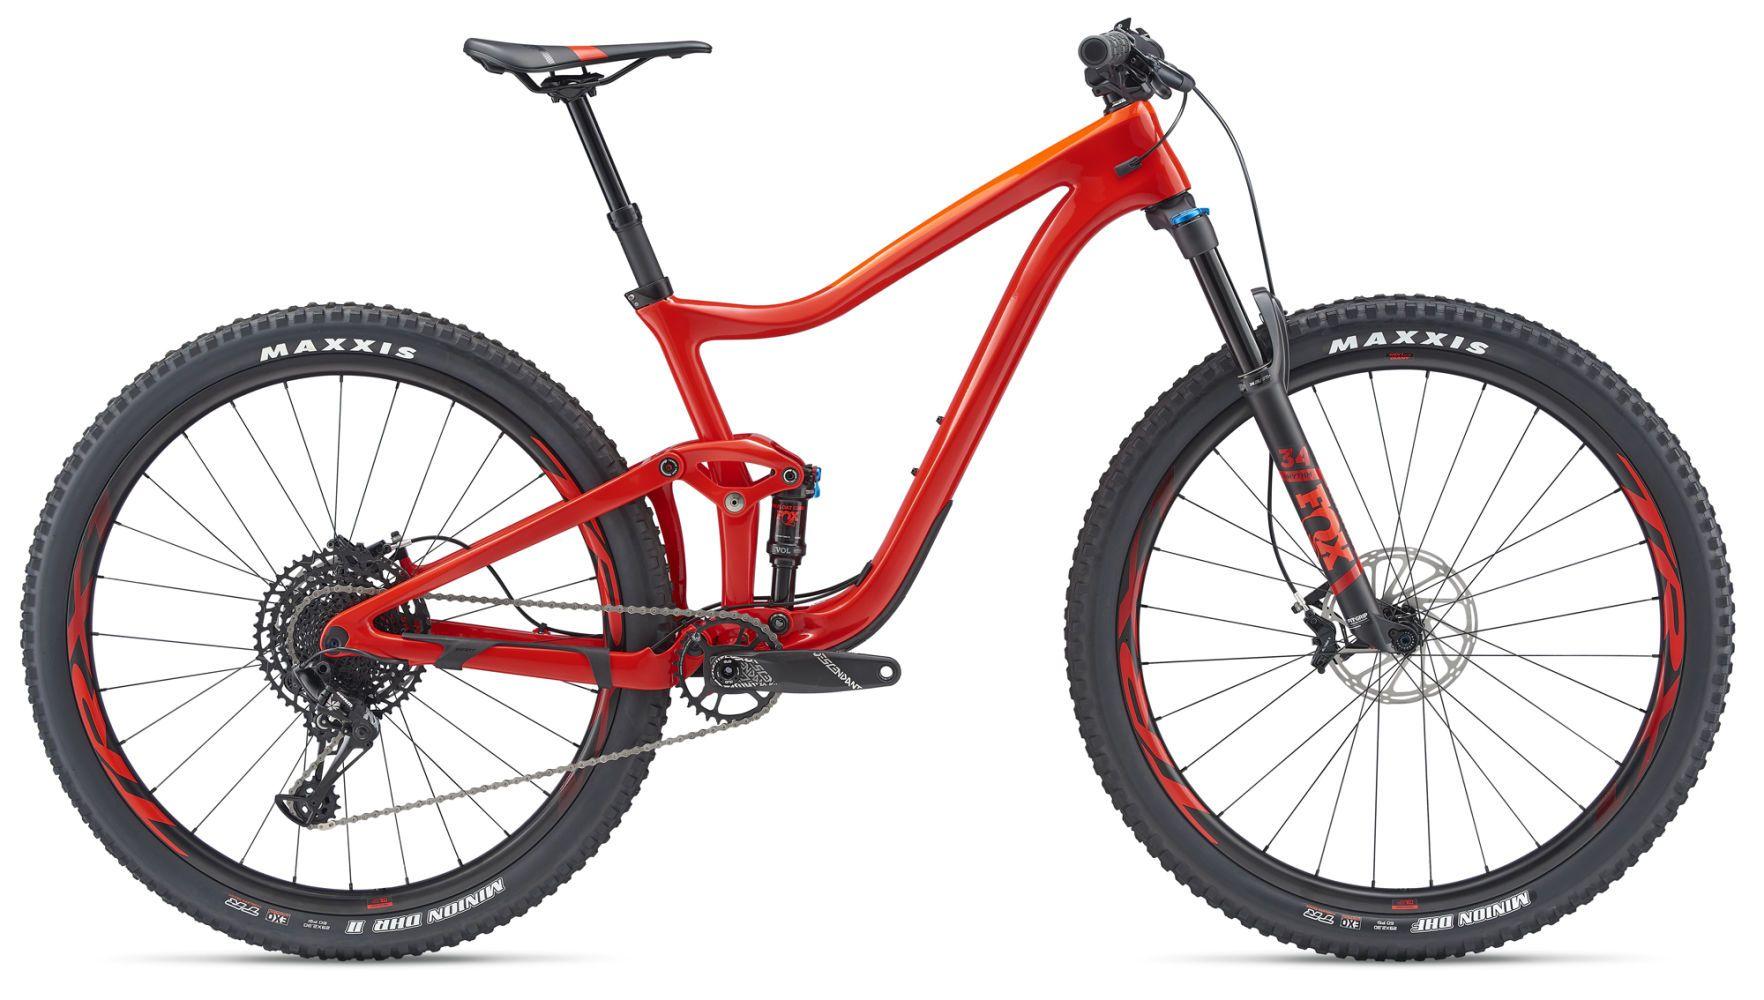 0bbe7d552df Giant Trance Advanced Pro 29 2 Mountain Bike 2019 - £3995 | Giant ...